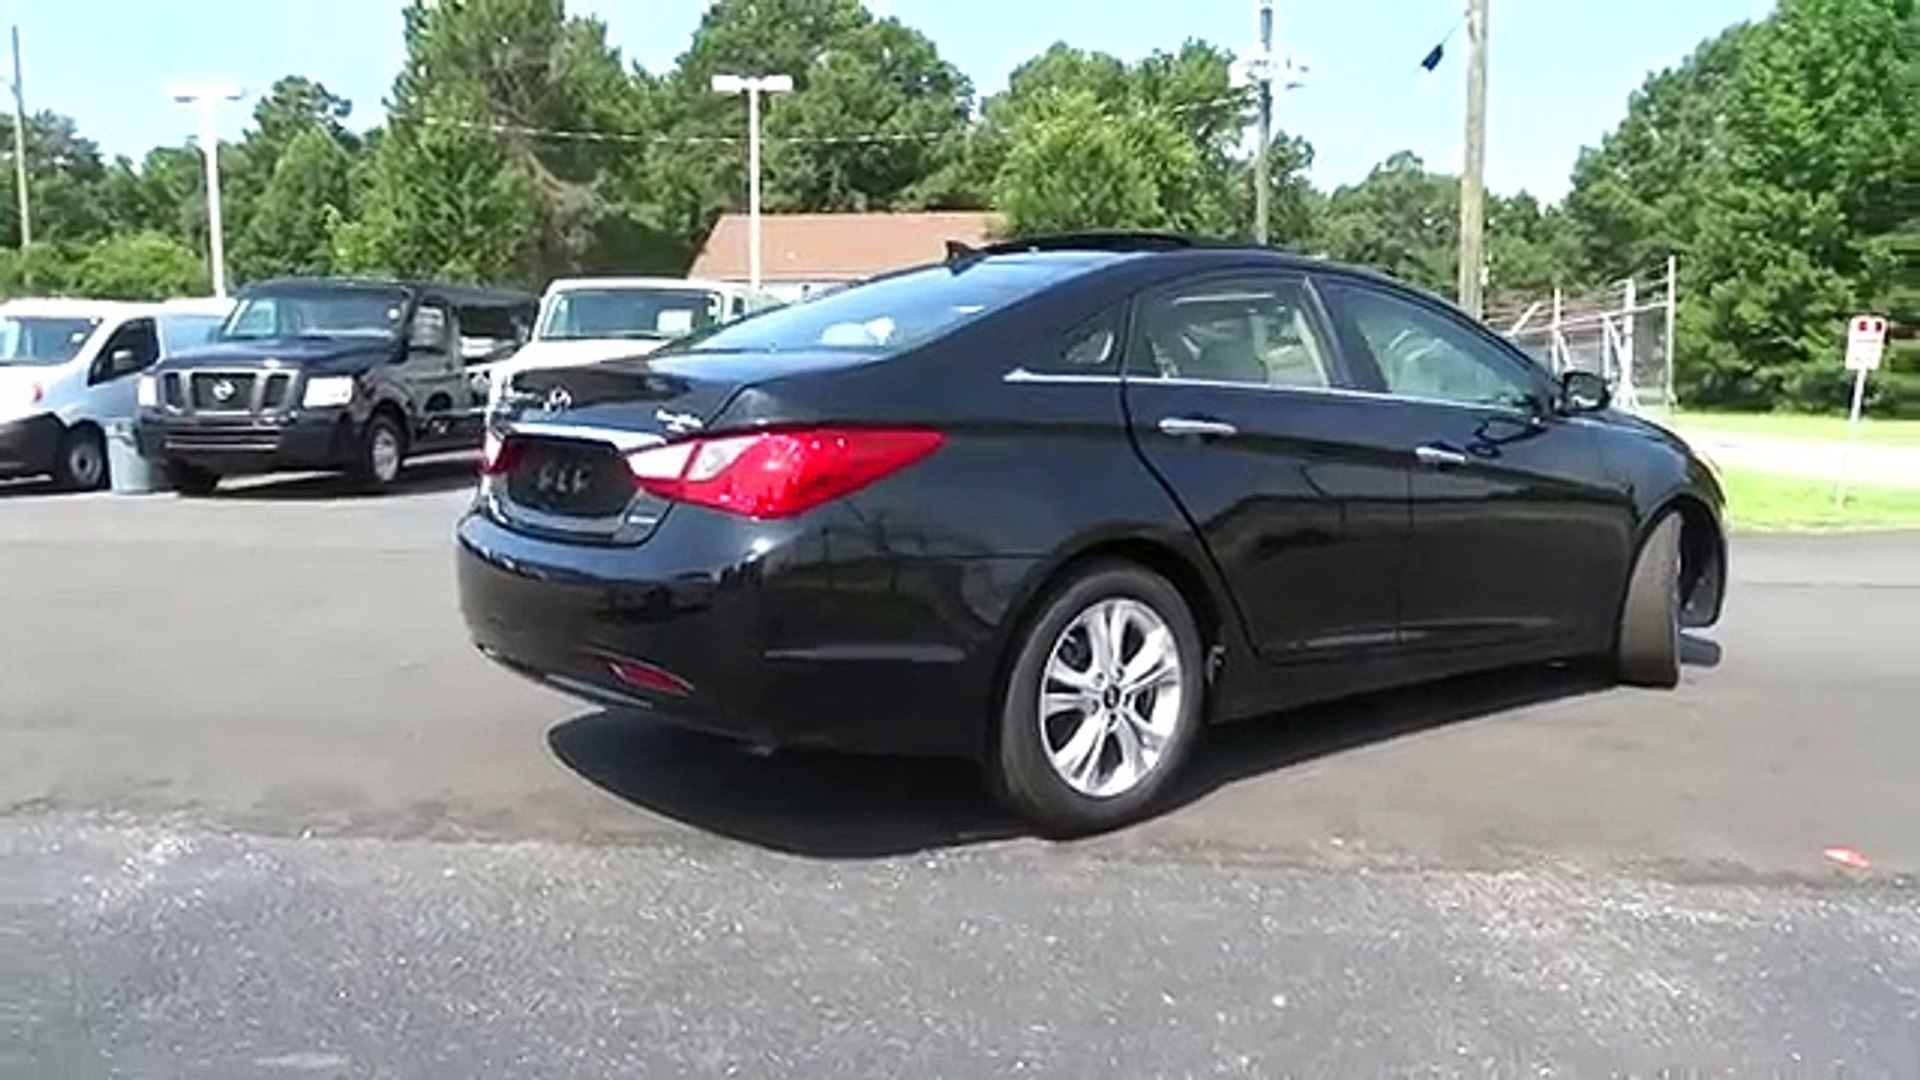 2012 Hyundai Sonata Clinton, Fayetteville, Goldsboro, Raleigh, Elizabethtown, NC CP6063